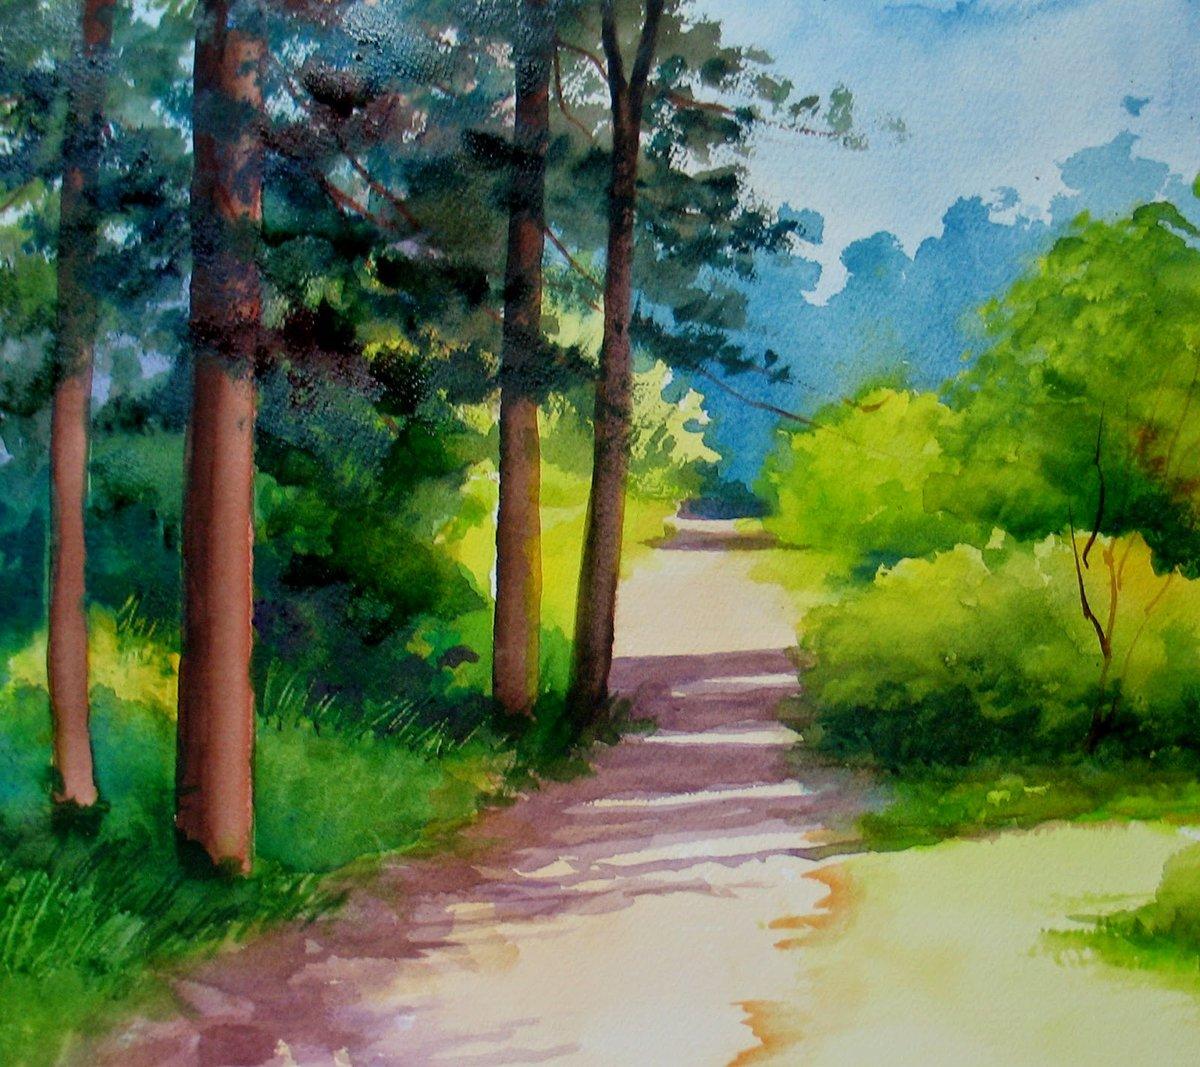 картинки пейзажа рисовать легко видео урок